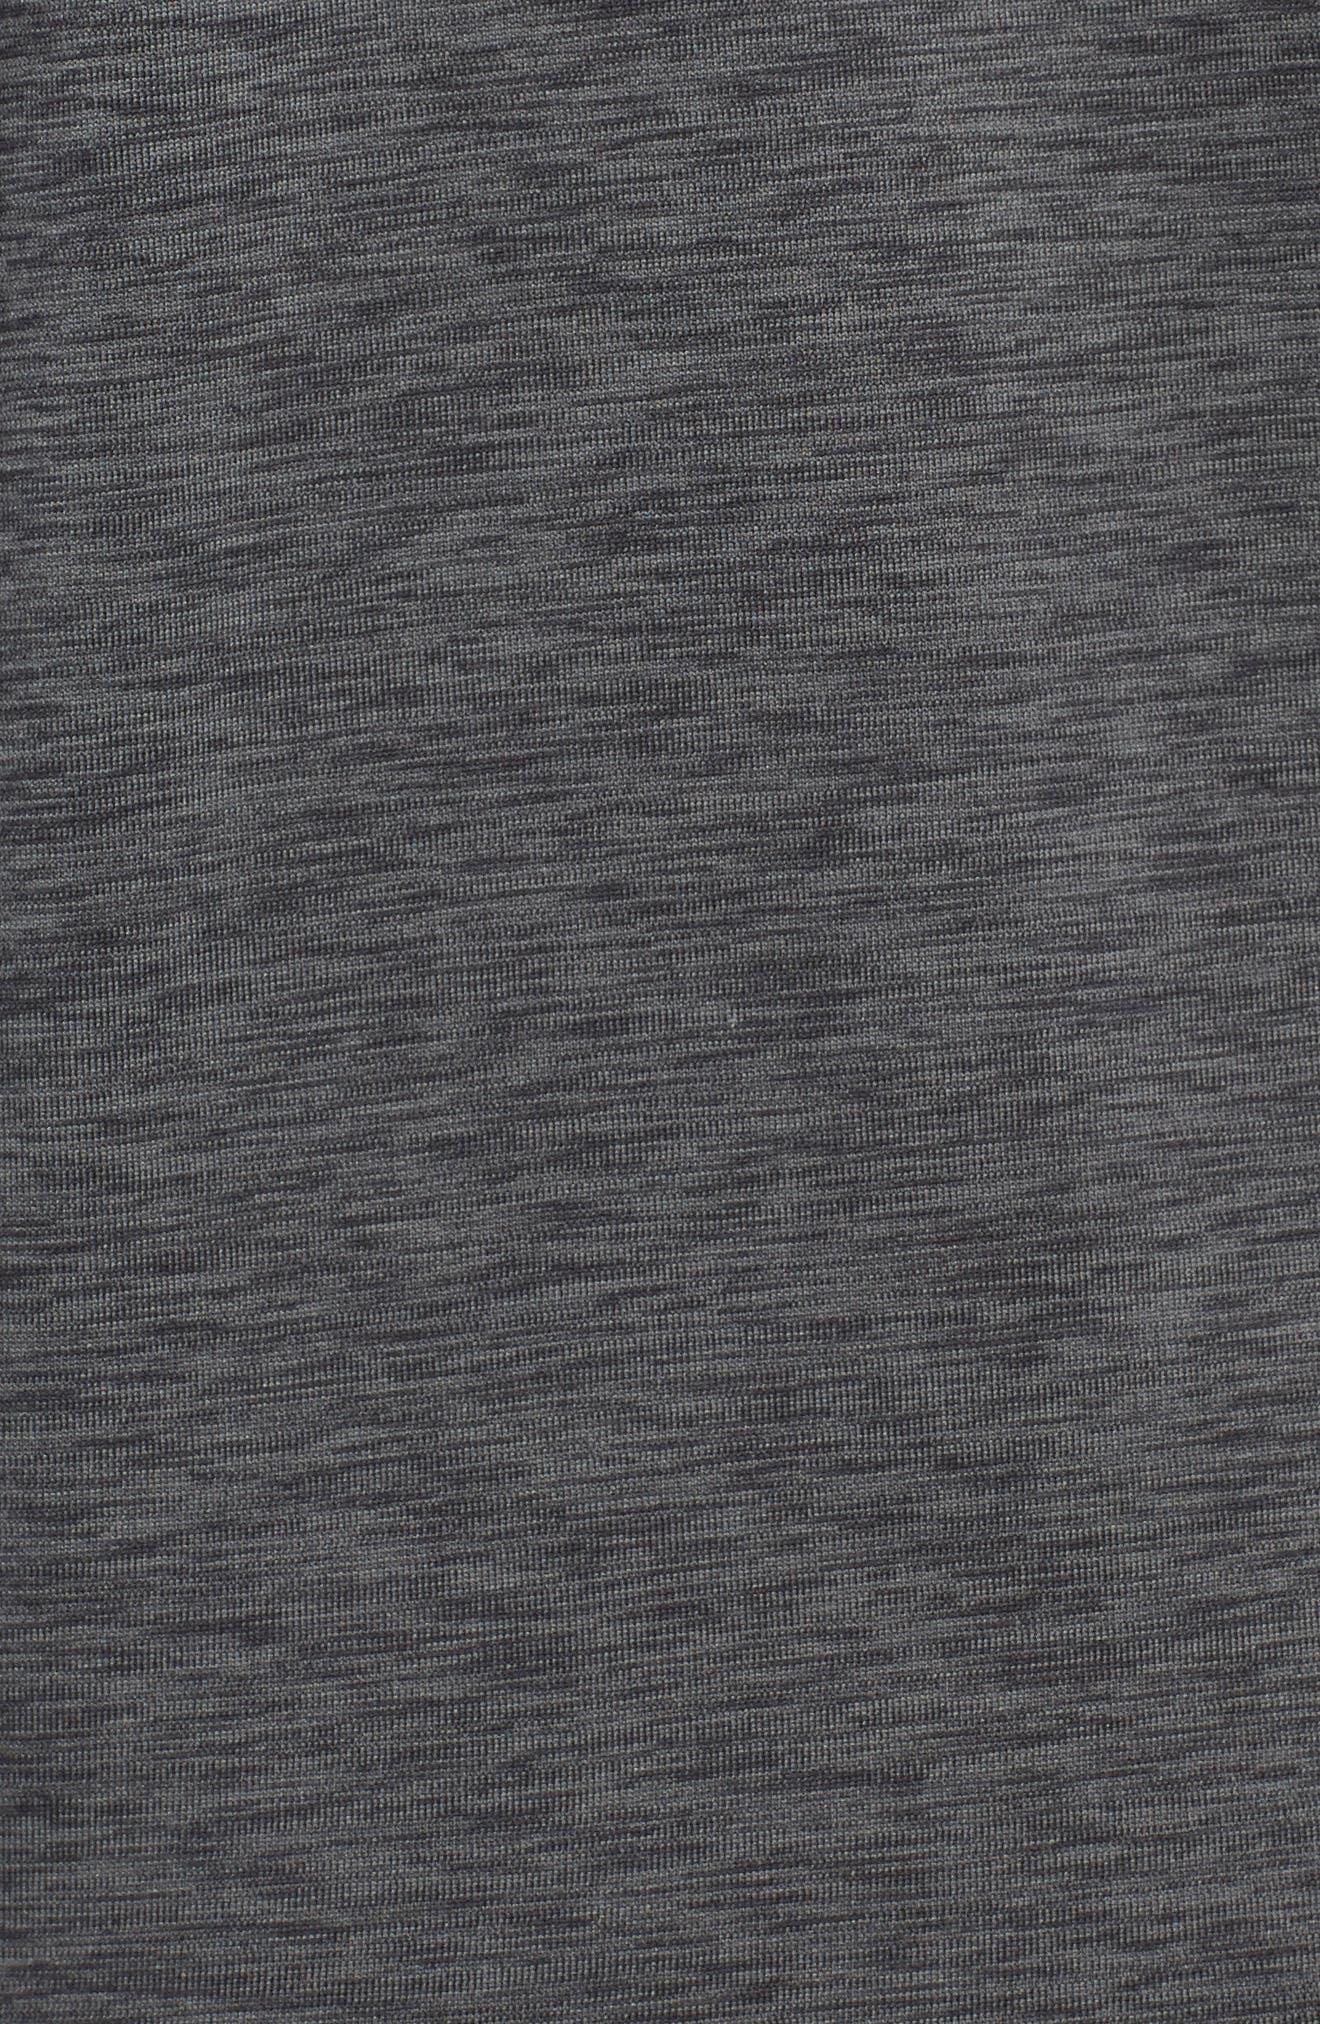 Hyper Dry Regular Fit Training Hoodie,                             Alternate thumbnail 5, color,                             ANTHRACITE/BLACK/BLACK